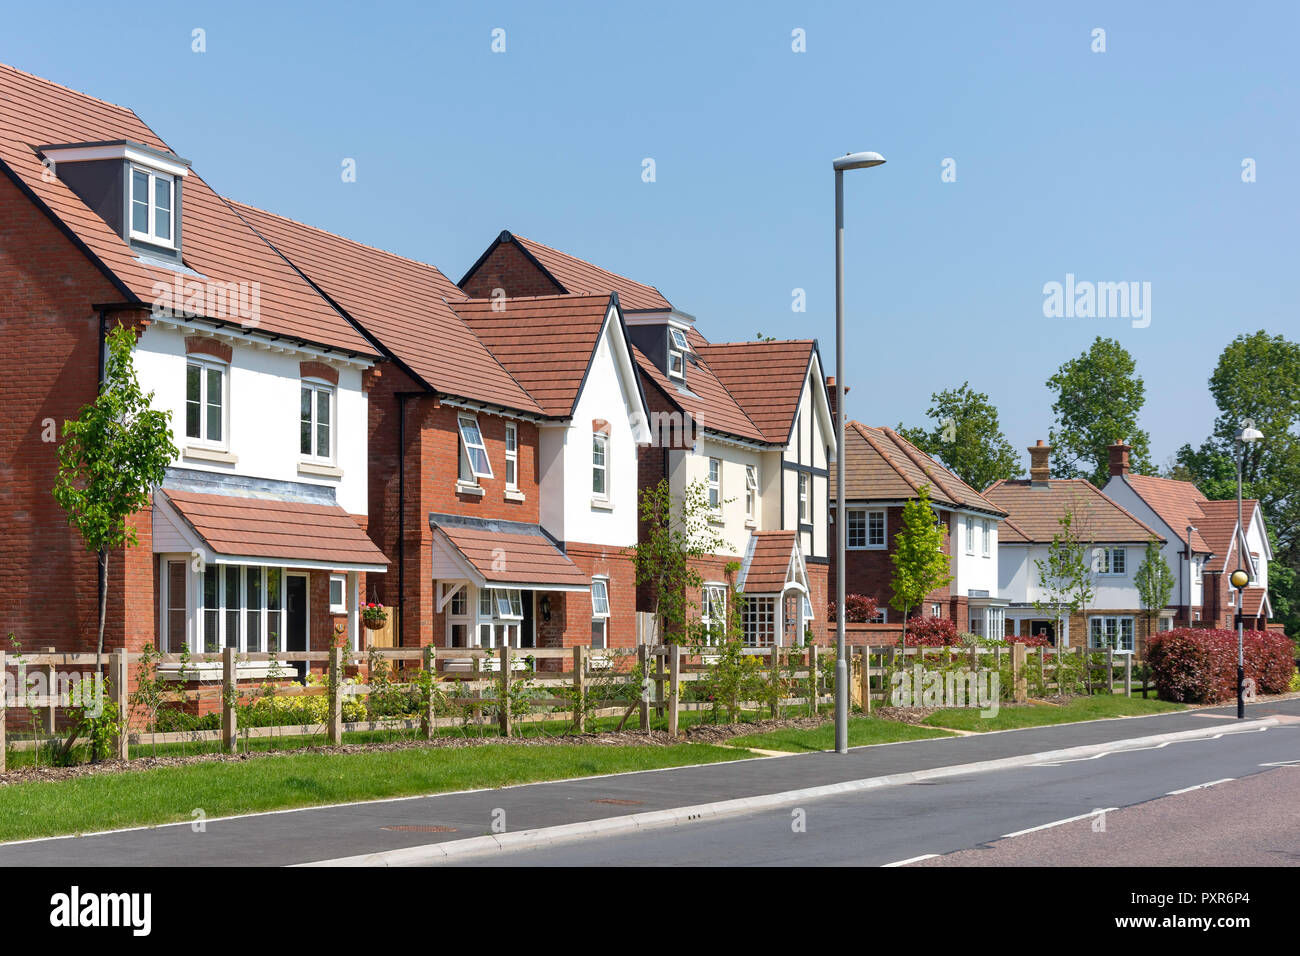 Westgate housing development, Worgret Road, Wareham, Dorset, England, United Kingdom - Stock Image